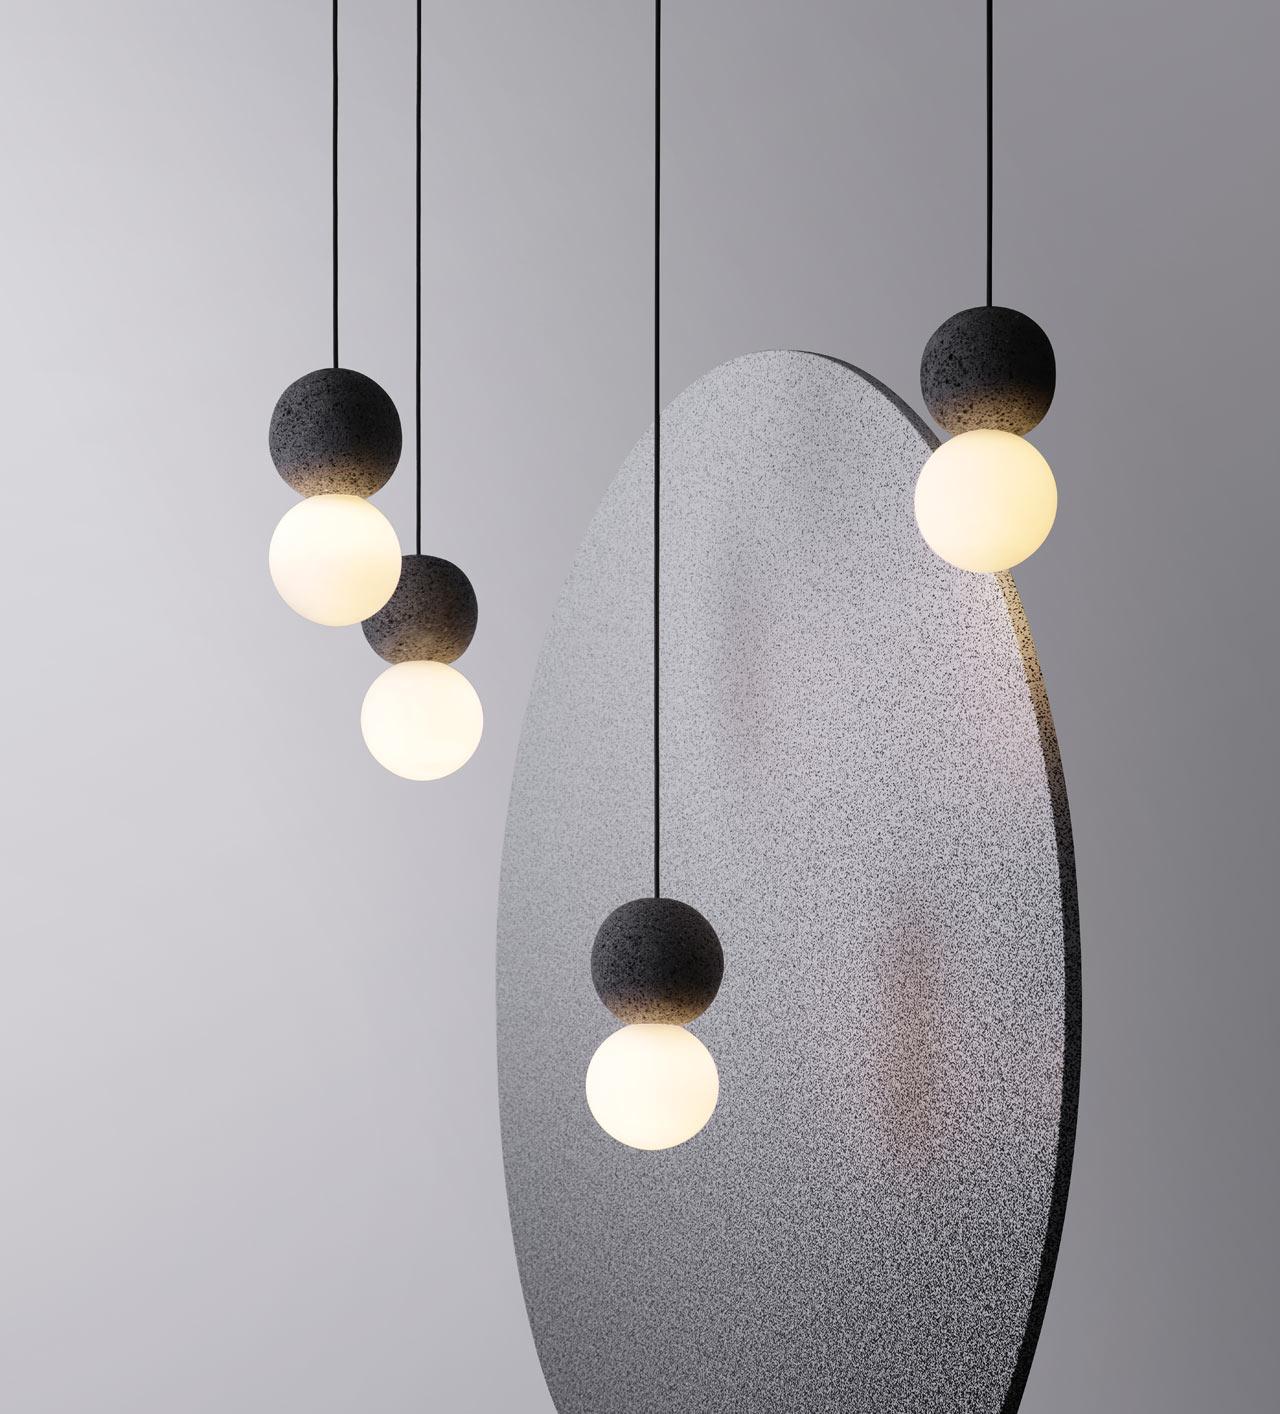 Studio davidpompa's Origo Lighting Explores Geometry and Volcanic Rock